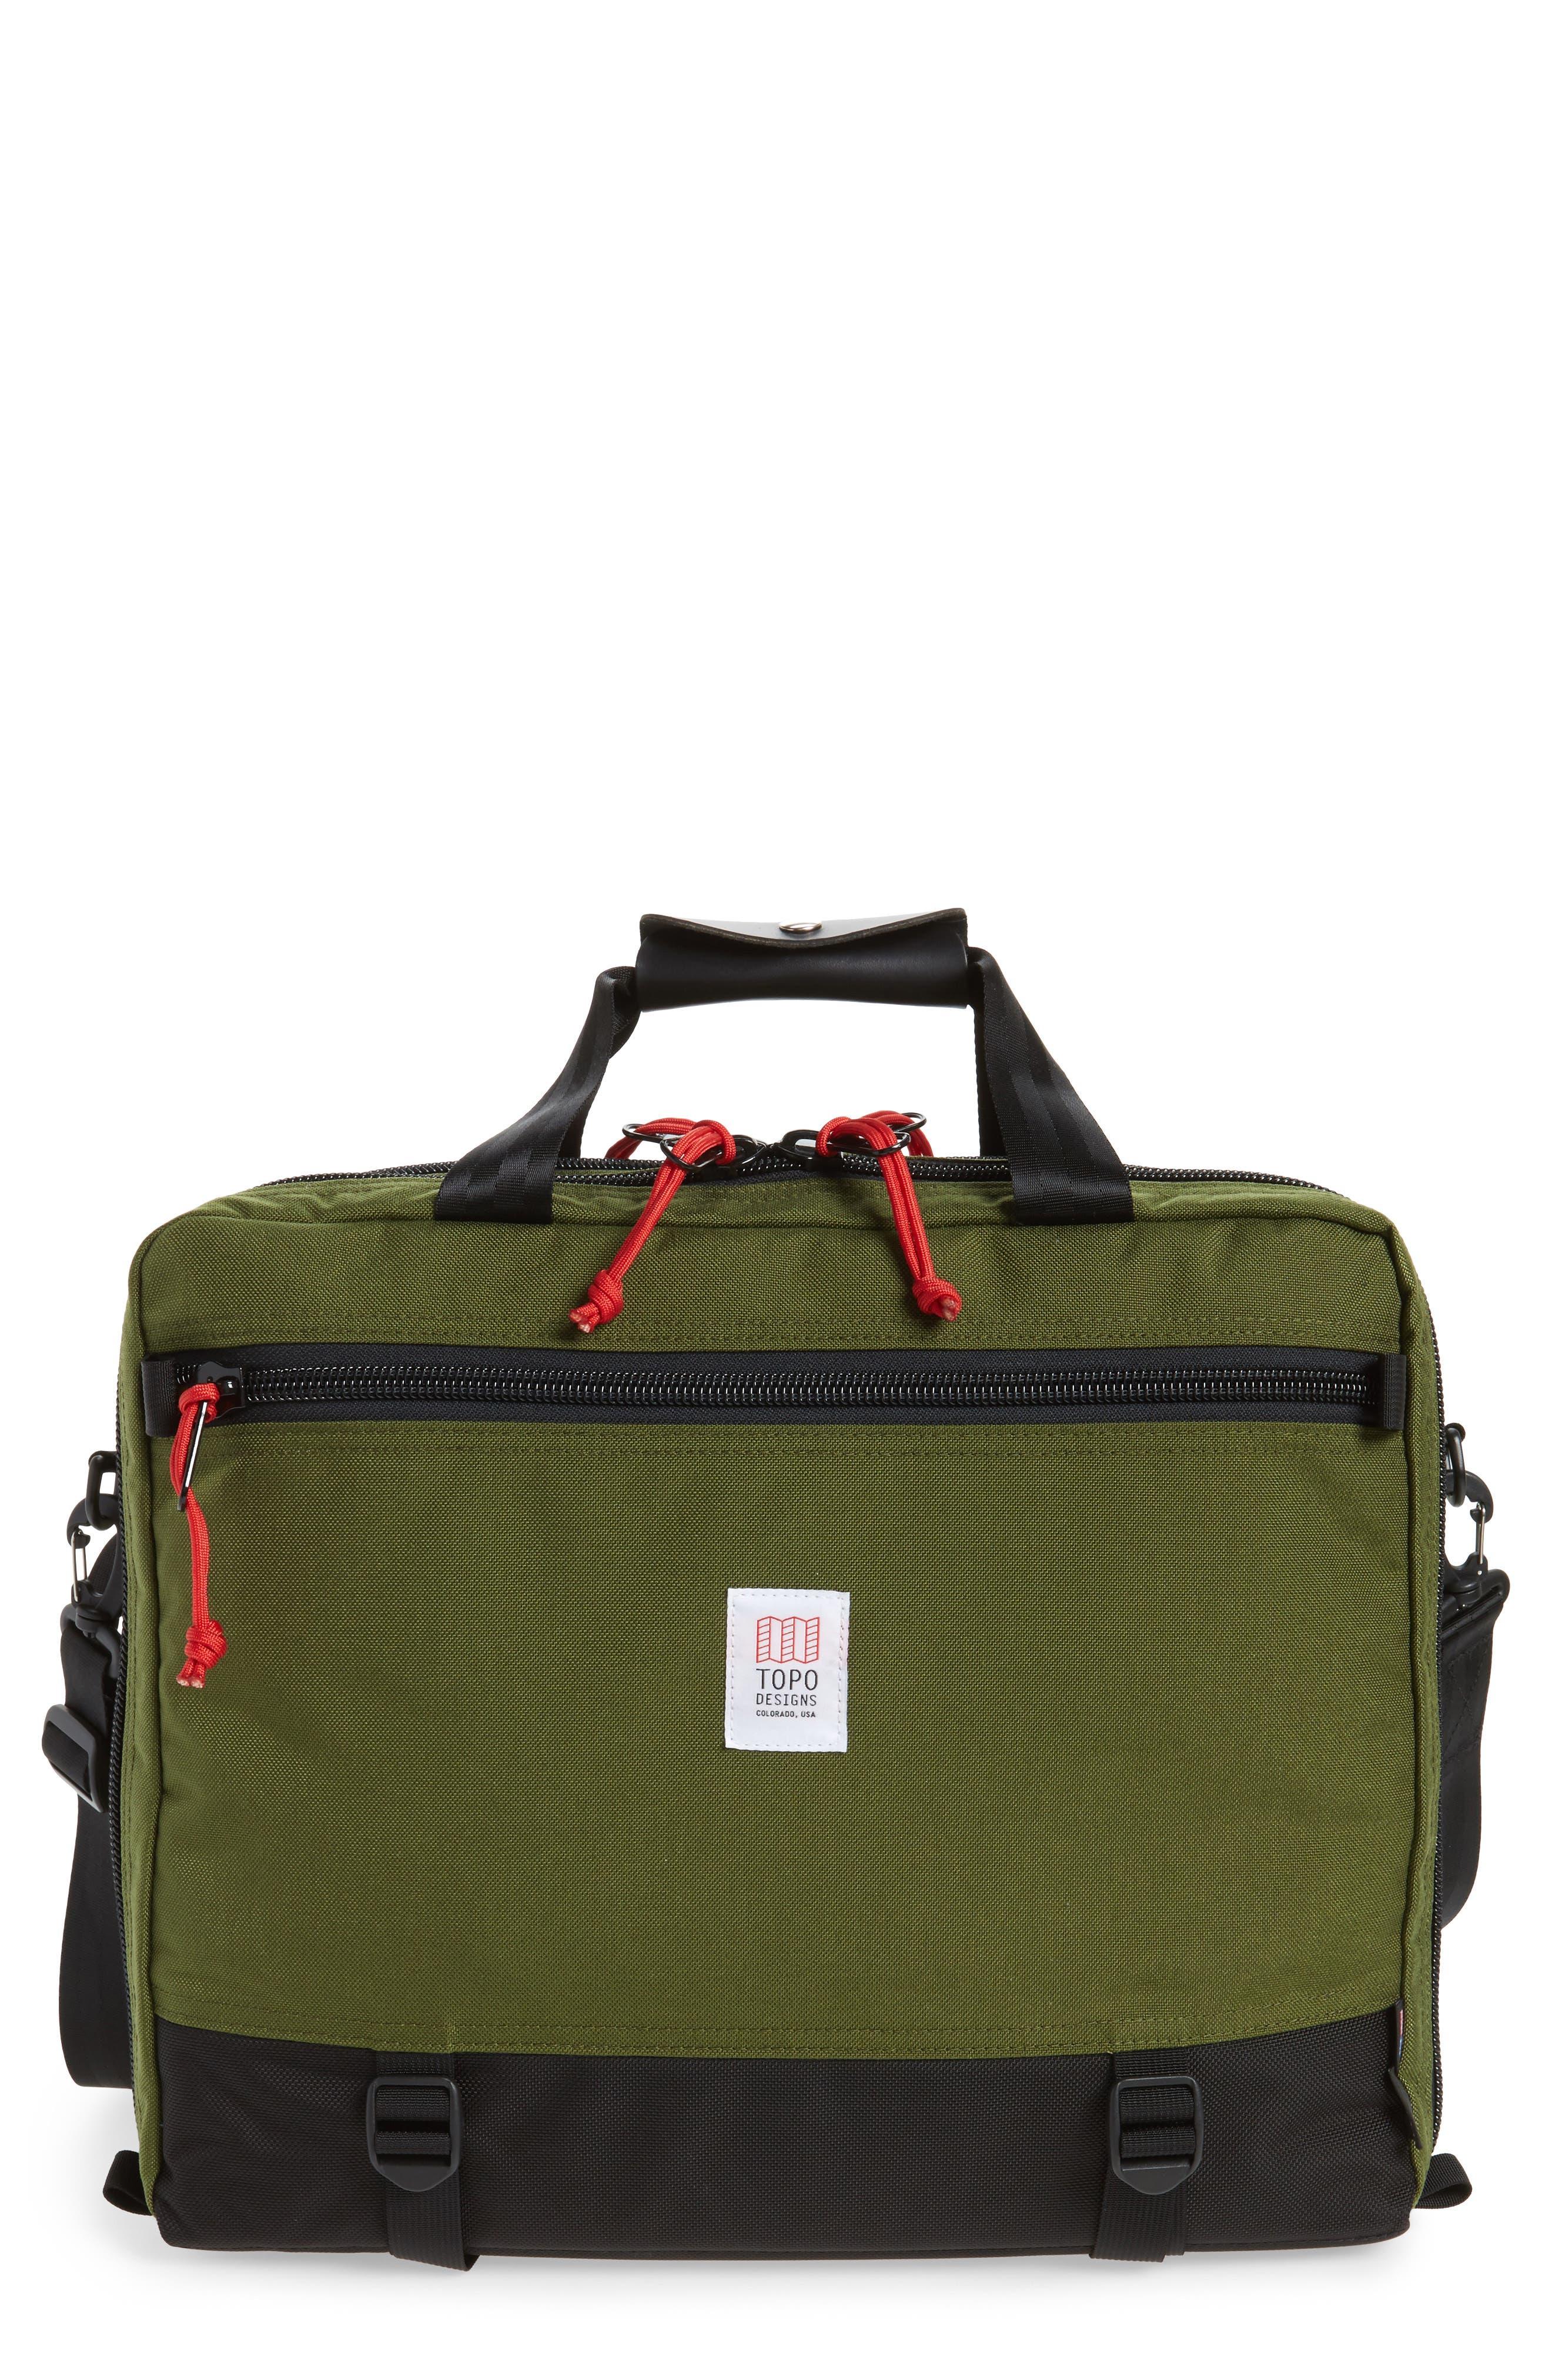 3-Day Briefcase,                         Main,                         color, OLIVE/ BALLISTIC BLACK